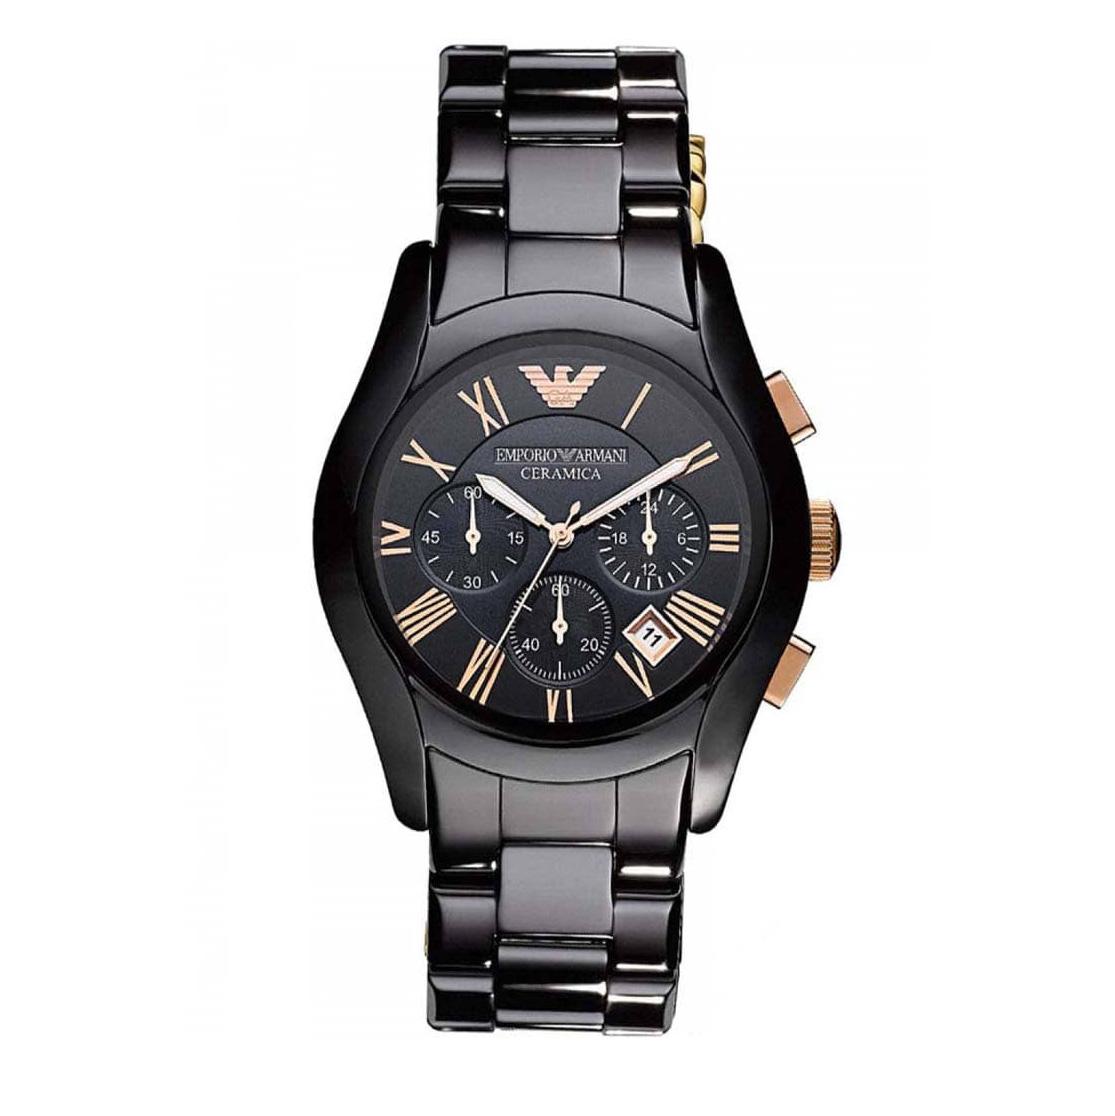 Emporio Armani男裝計時手錶 AR1410 – 情侶錶 | ARMANI 手錶 | 手錶批發 – WATCHVIVA